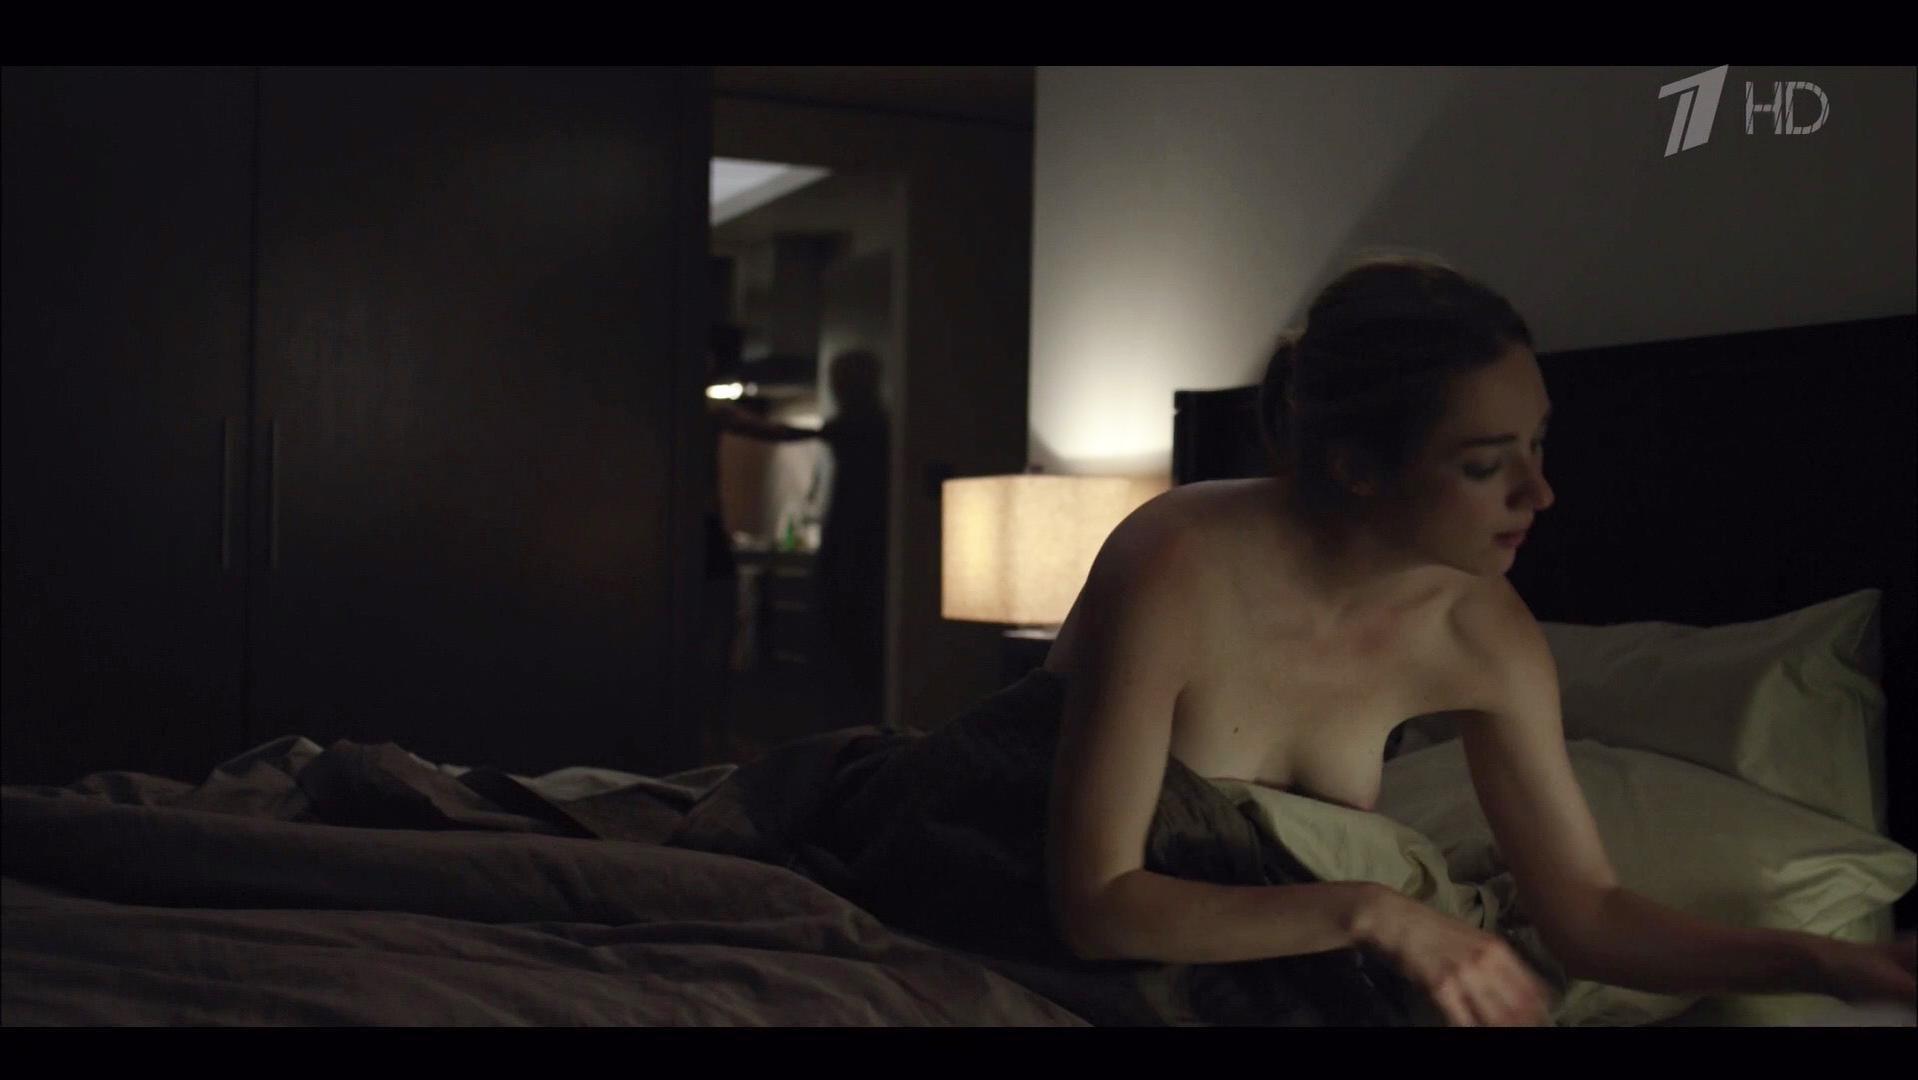 Kristen Connolly nude - House Of Cards s01e01 (2013)